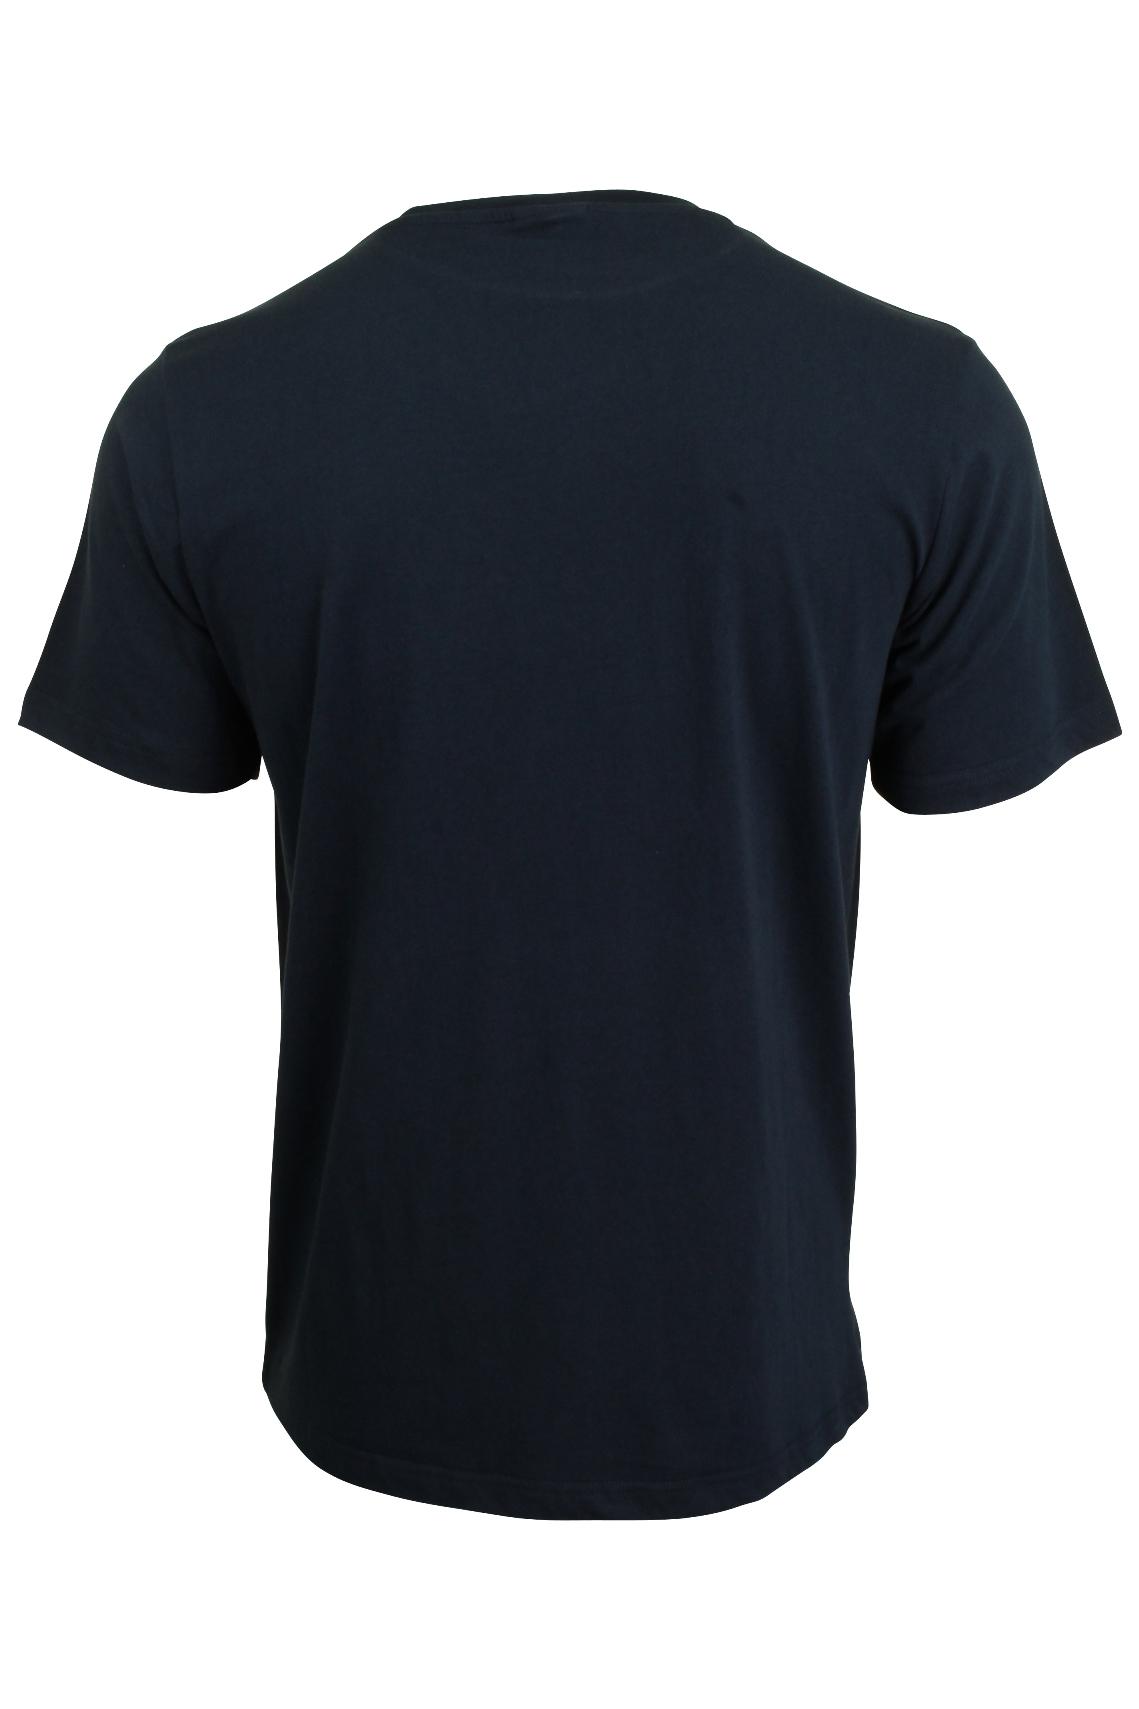 Mens-Ellesse-T-Shirt-039-Prado-039-Short-Sleeved thumbnail 9